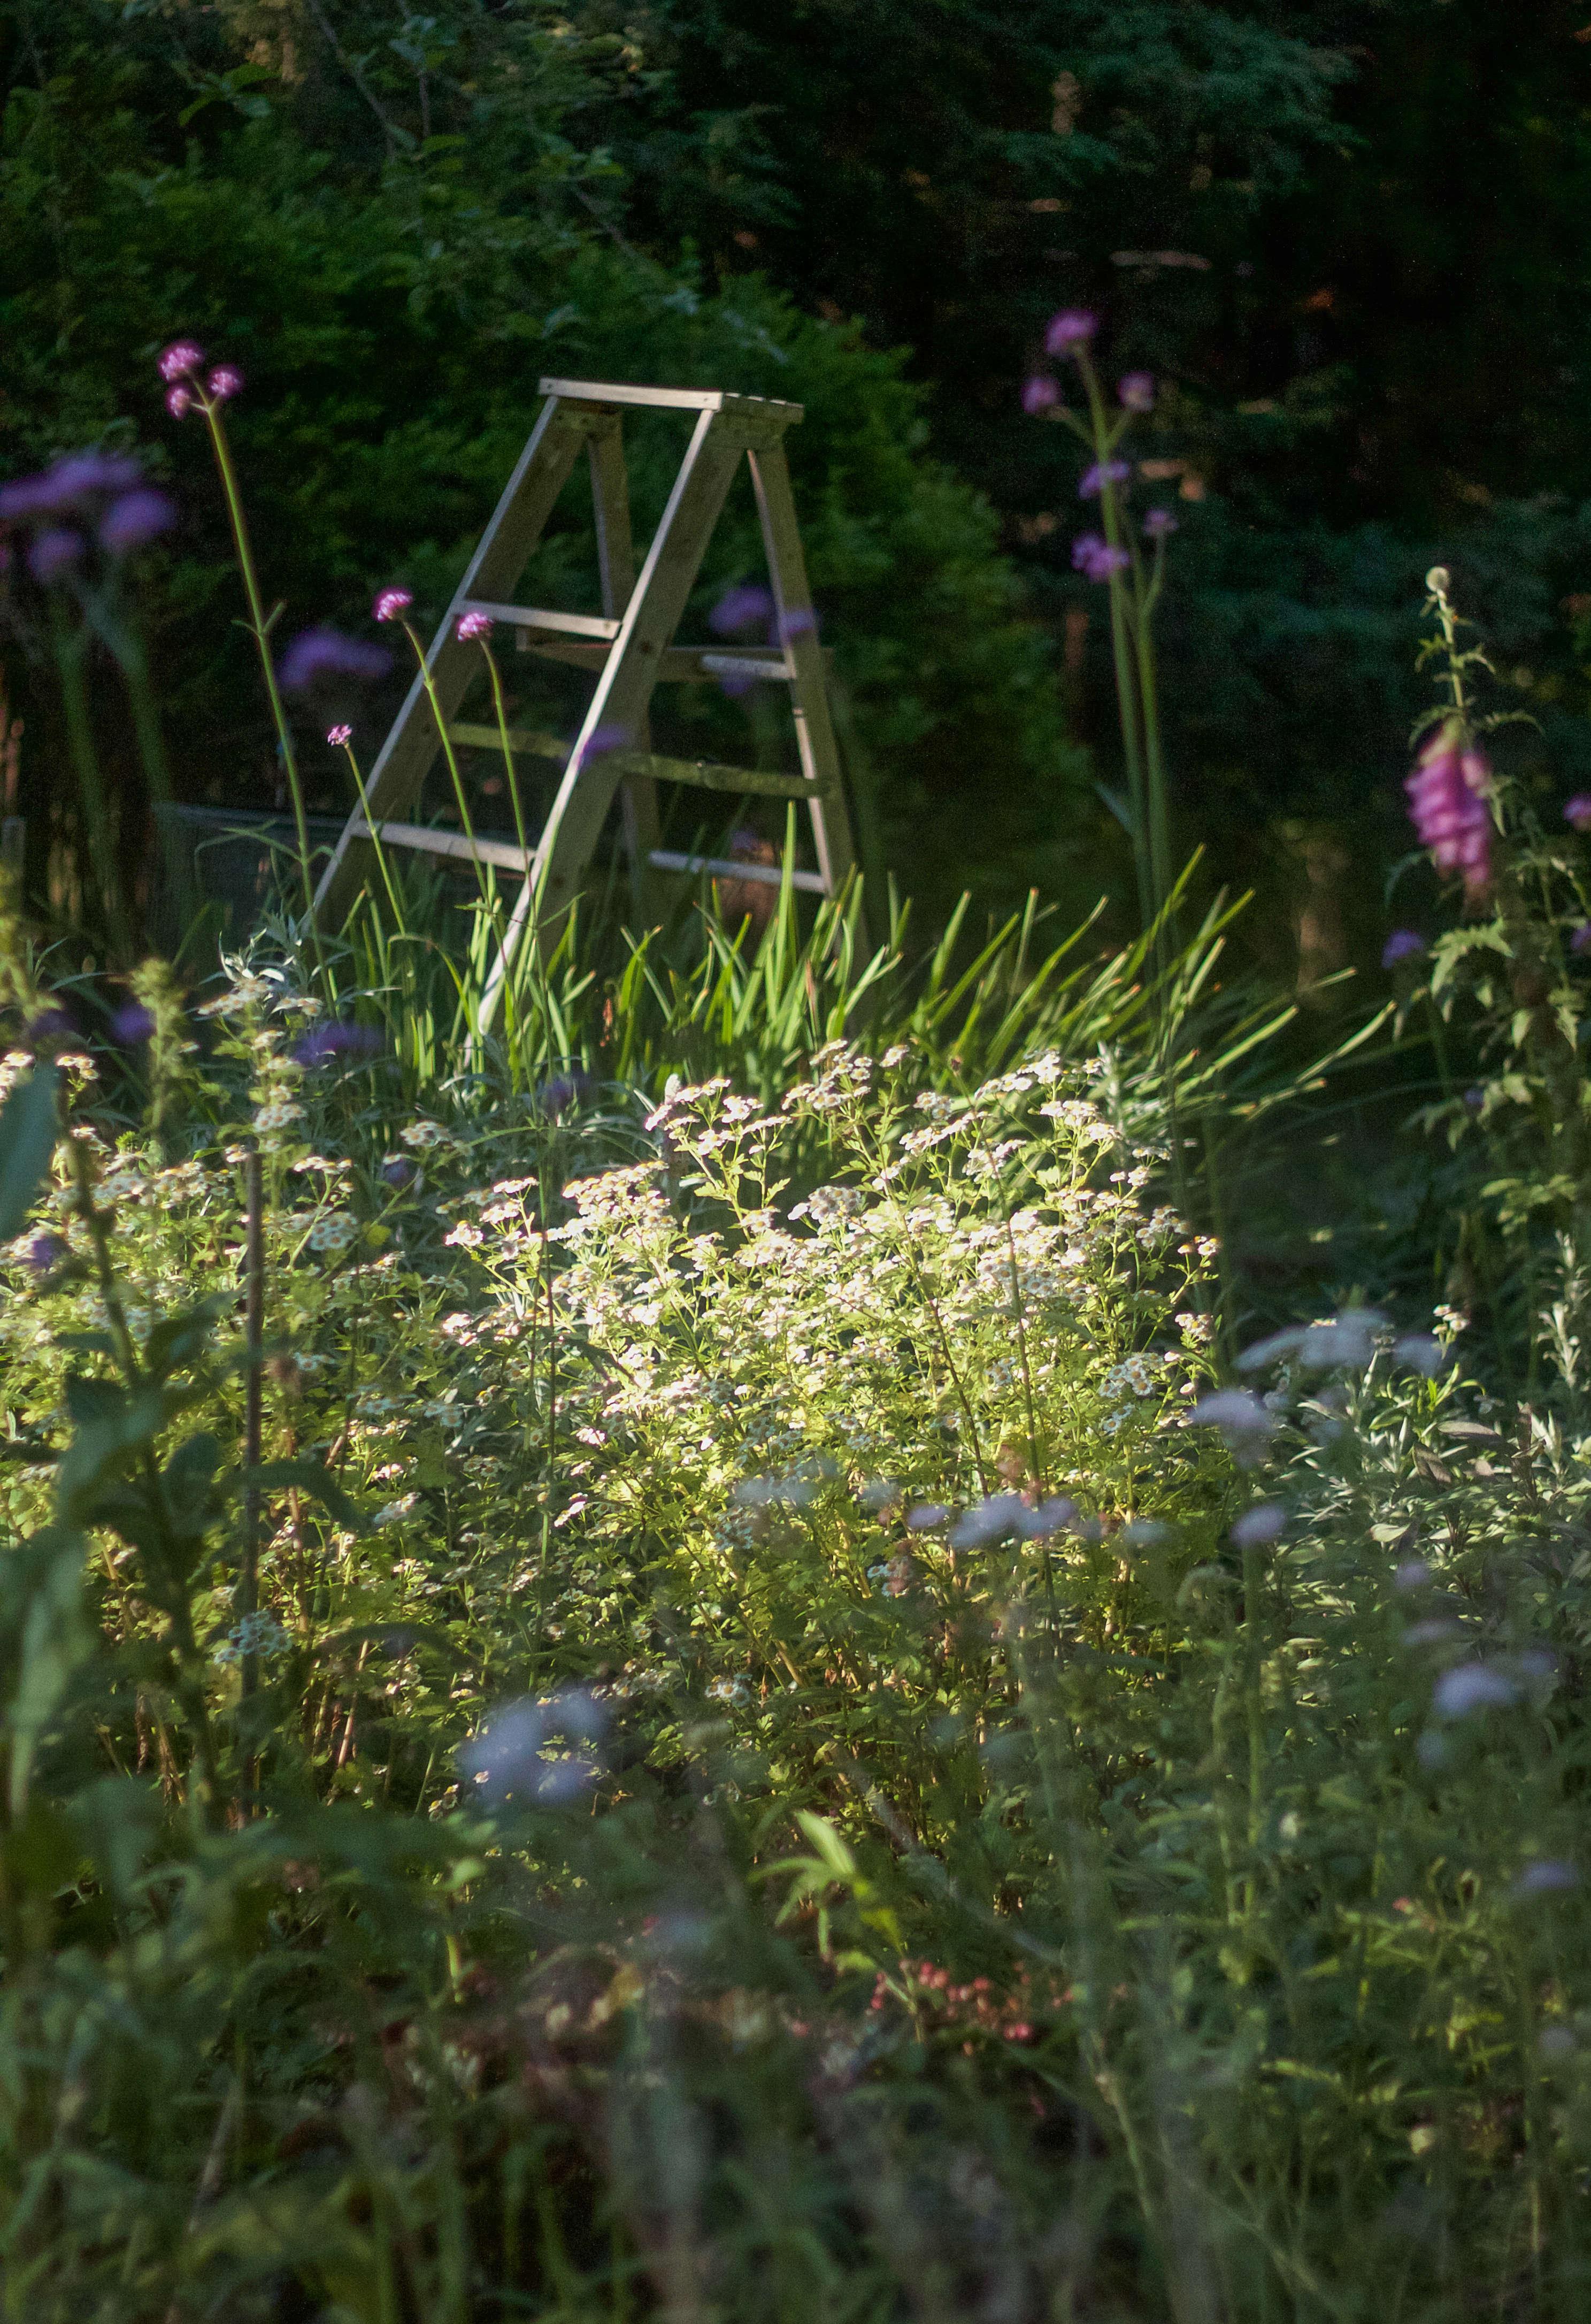 A garden ladder in the July twilight.